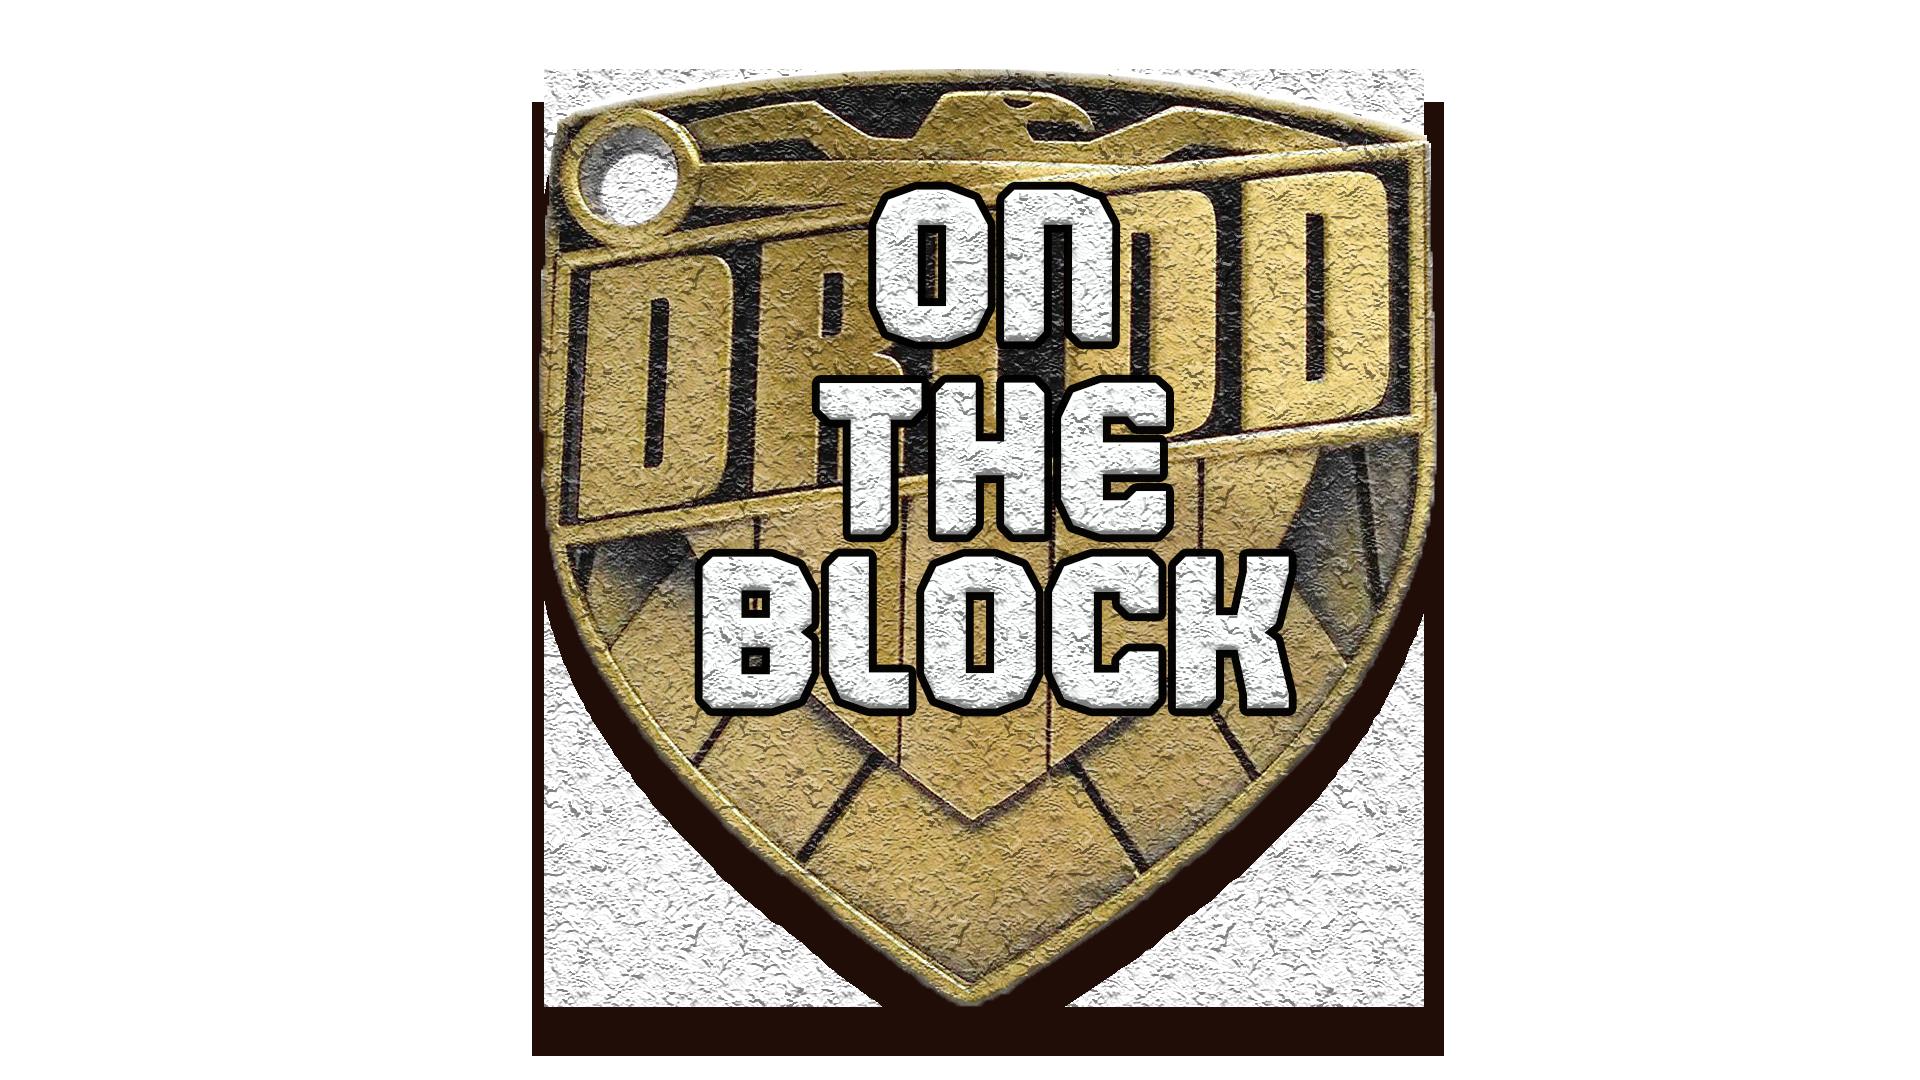 Episode 1 - Judge Dredd: On The Block show art